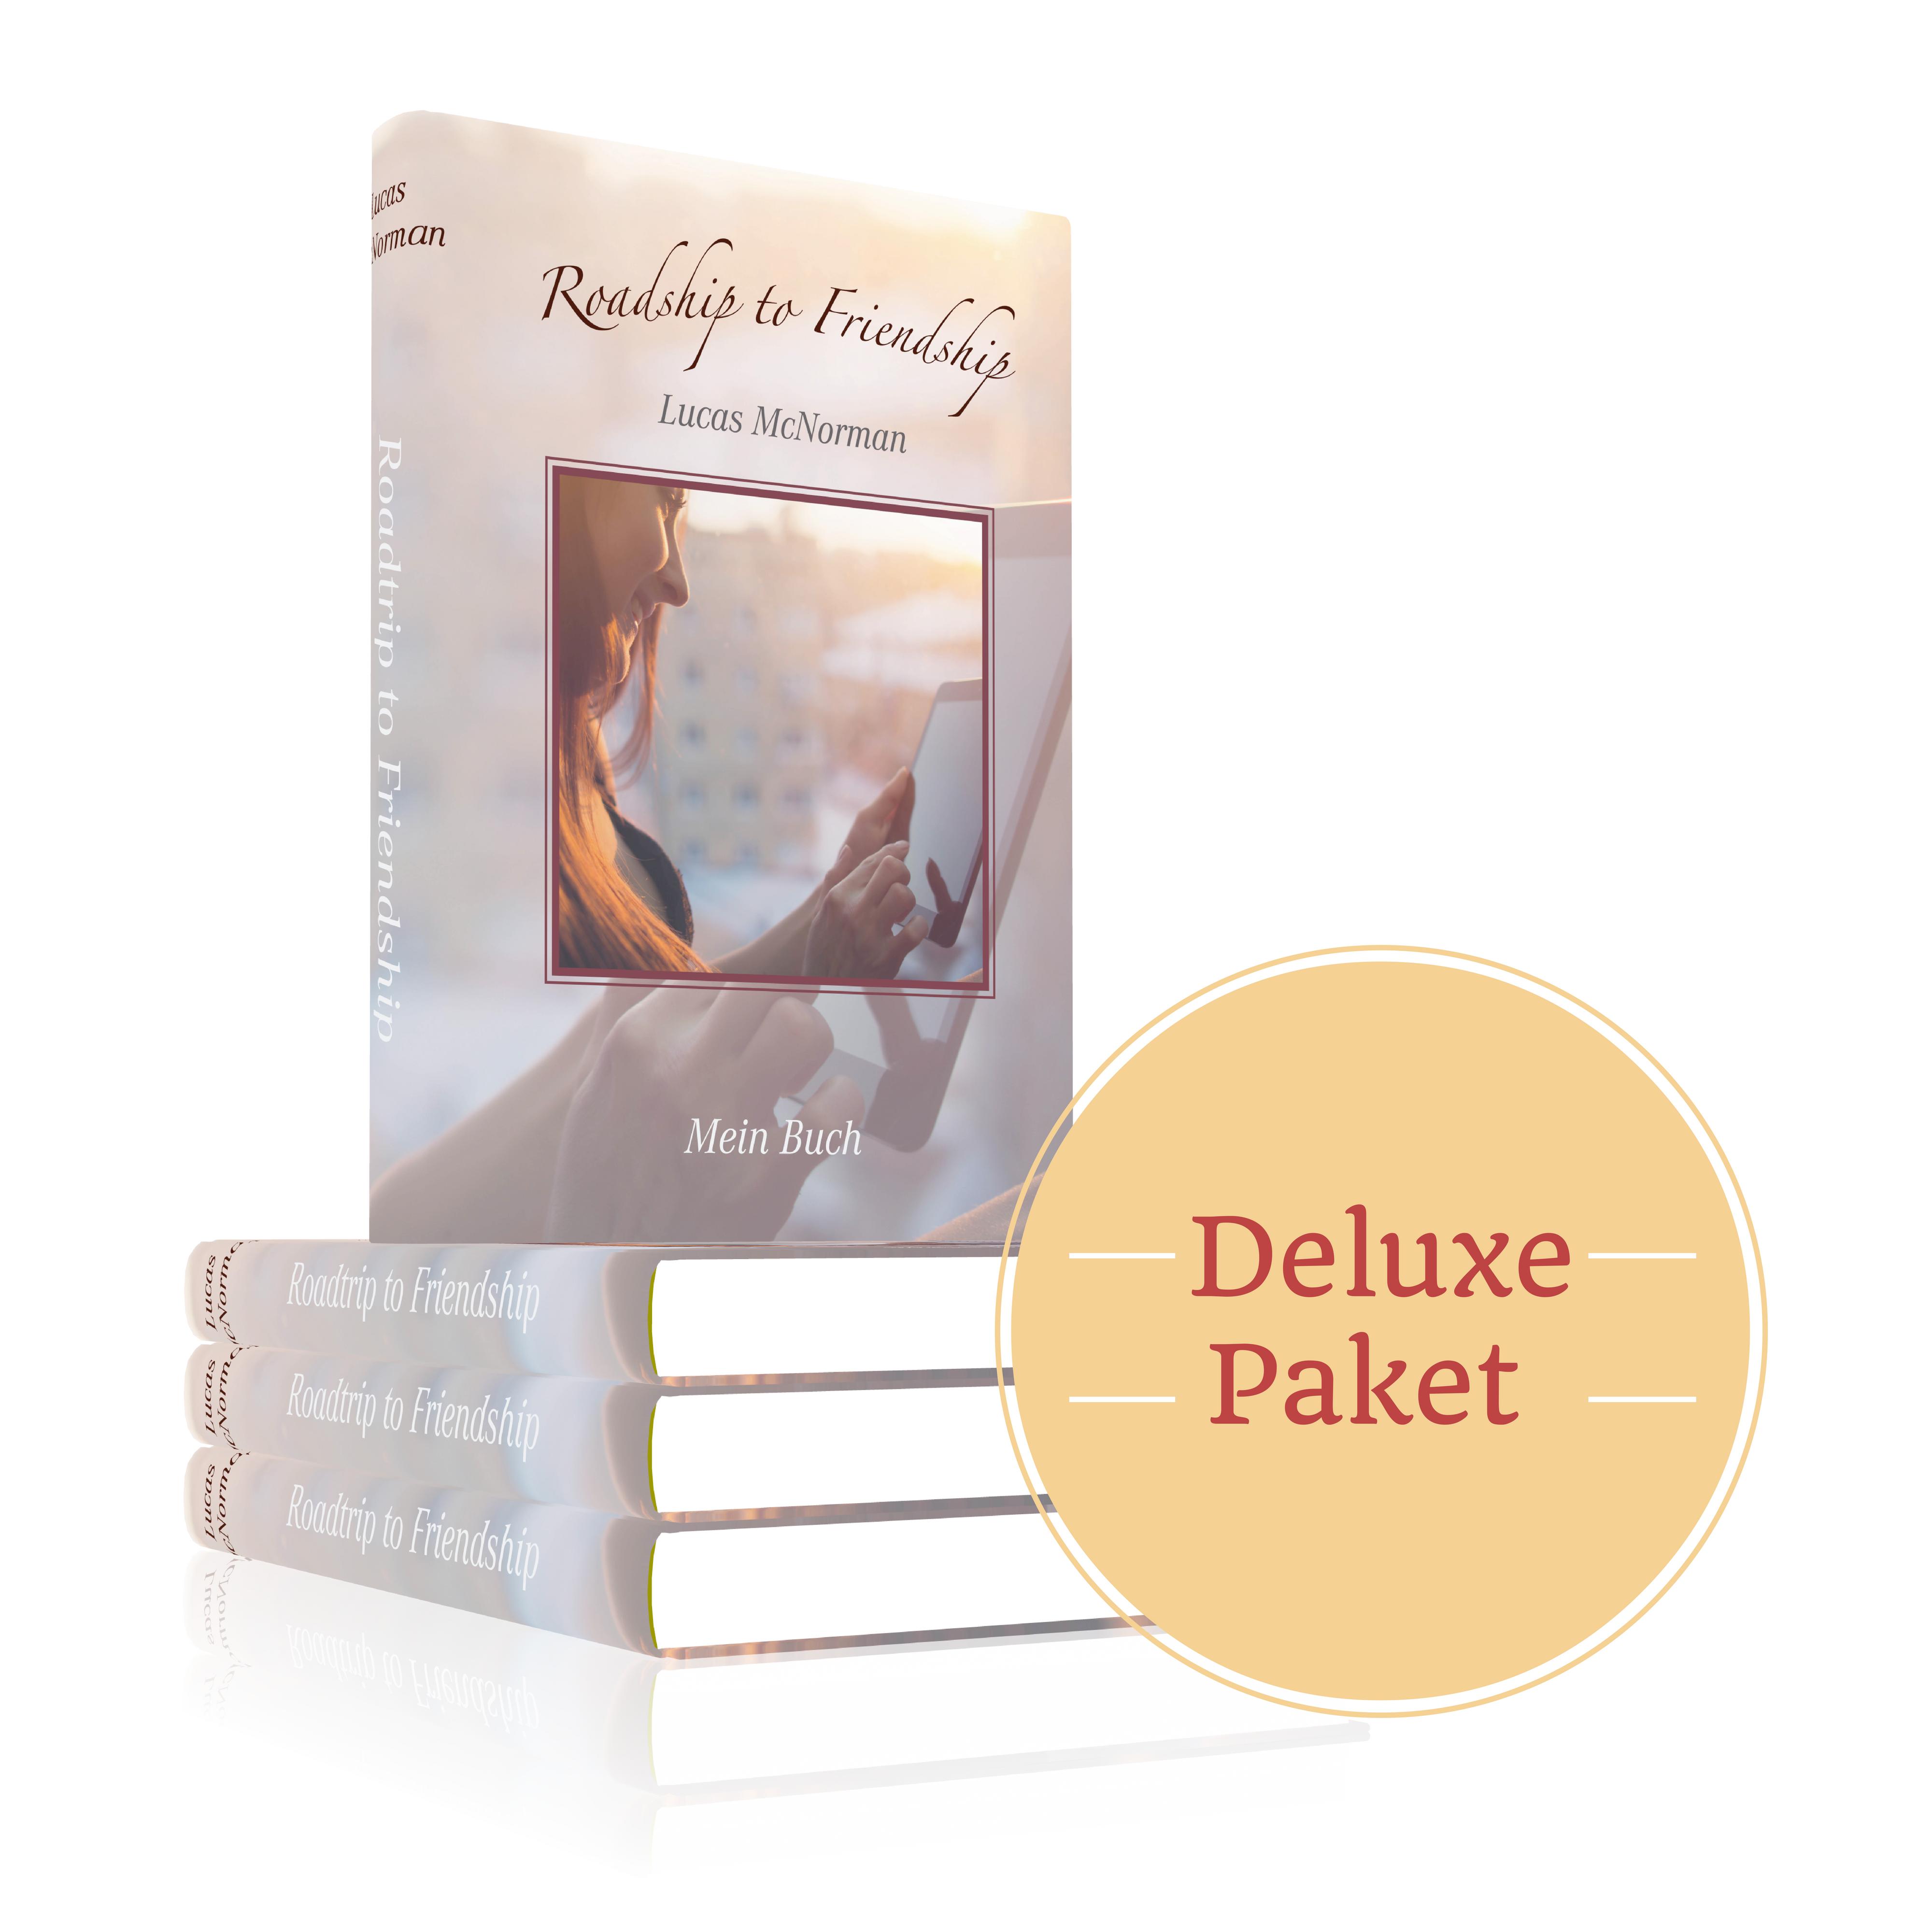 Deluxe Paket